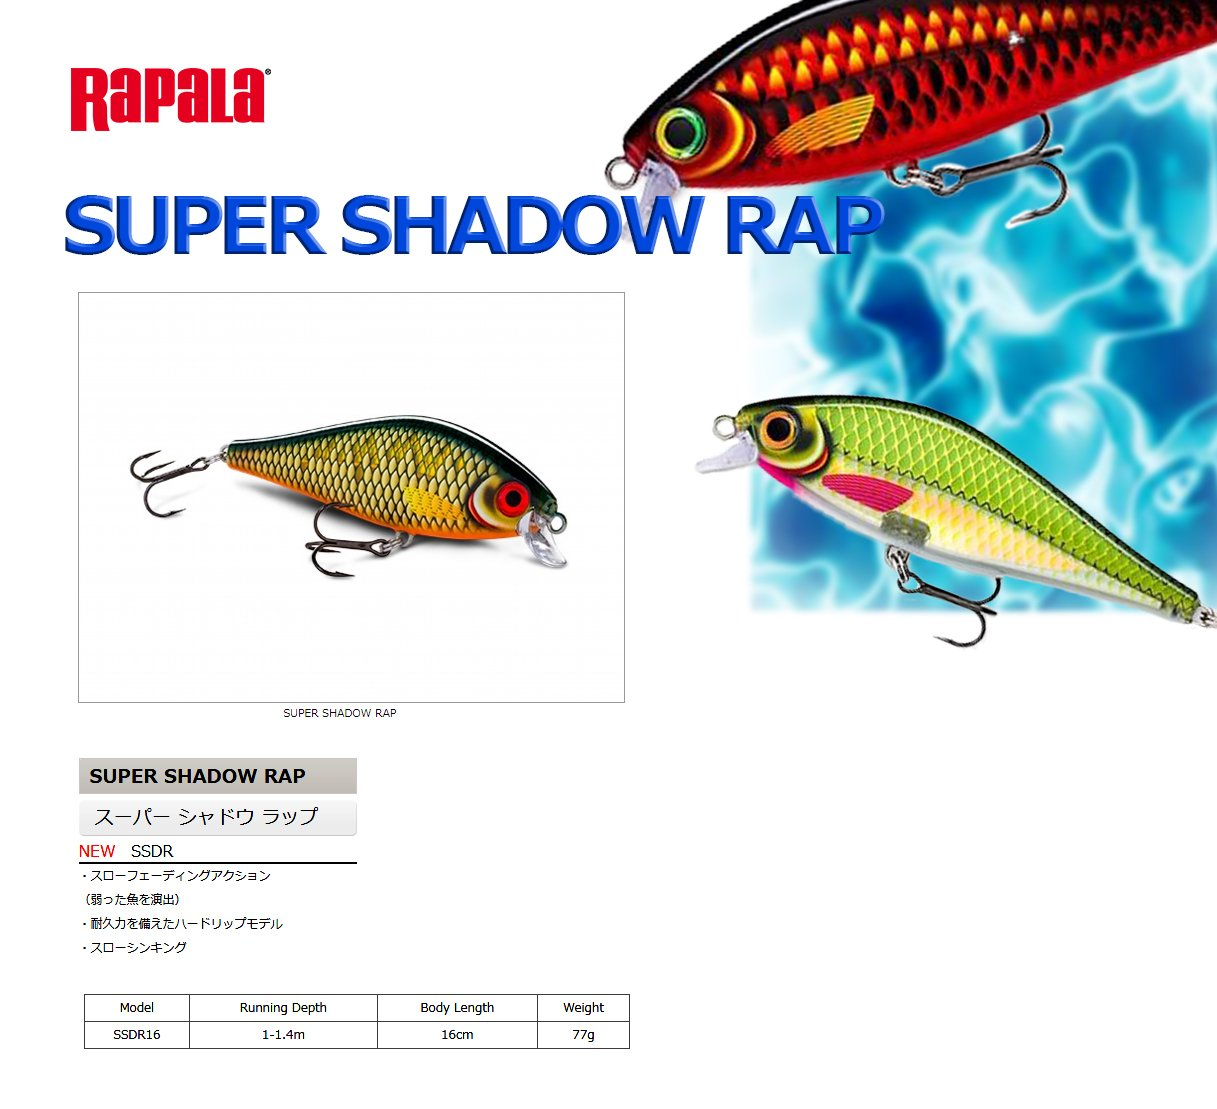 Rapala Super Shadow Rap Predator Bait Slow Fading Action